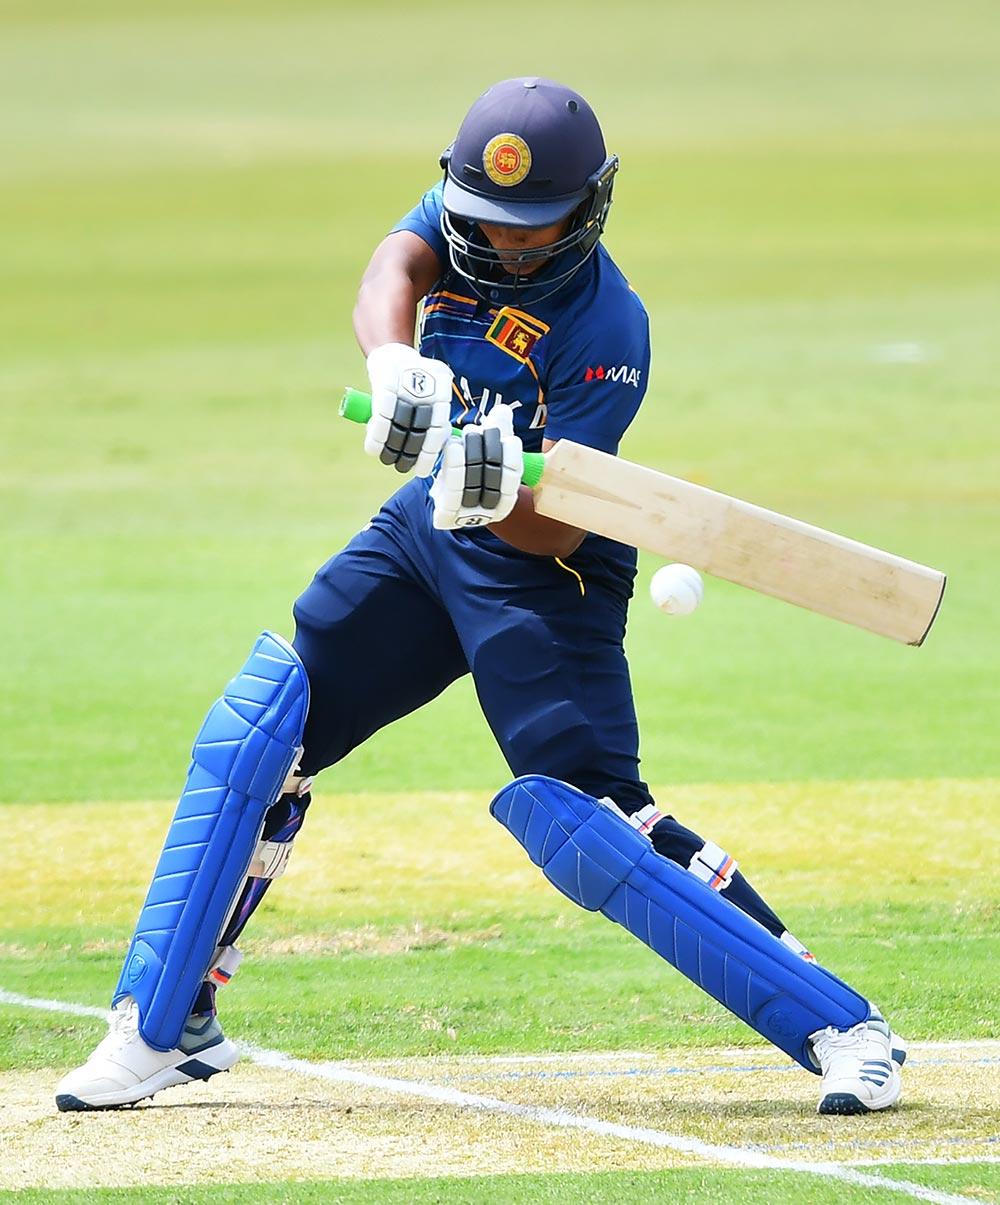 Opener Hasini Perera hit 22 for Sri Lanka // ICC/Getty